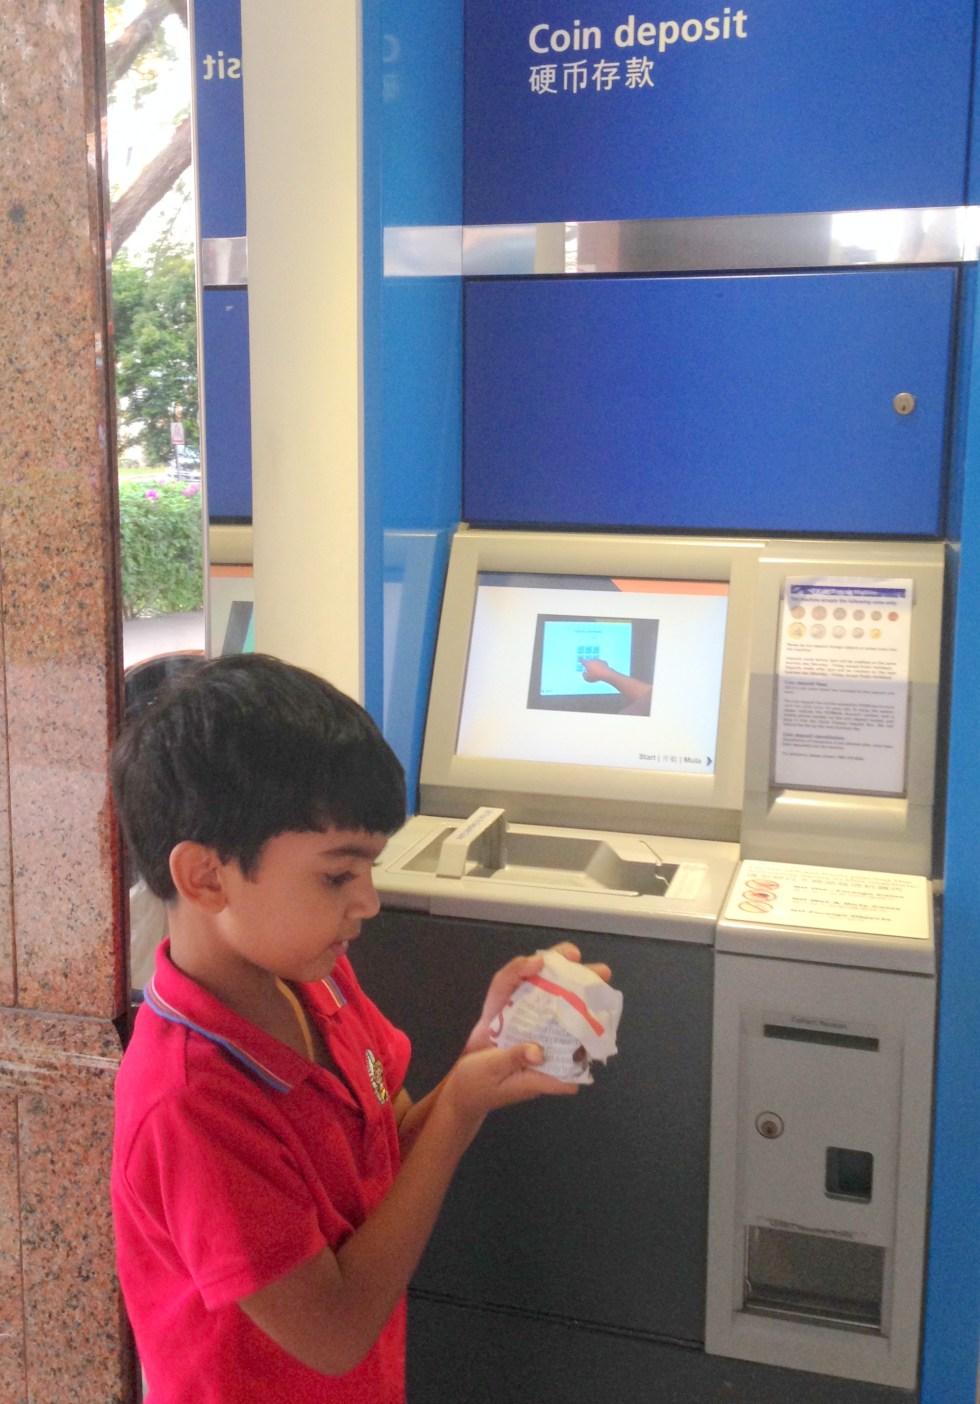 coins deposit